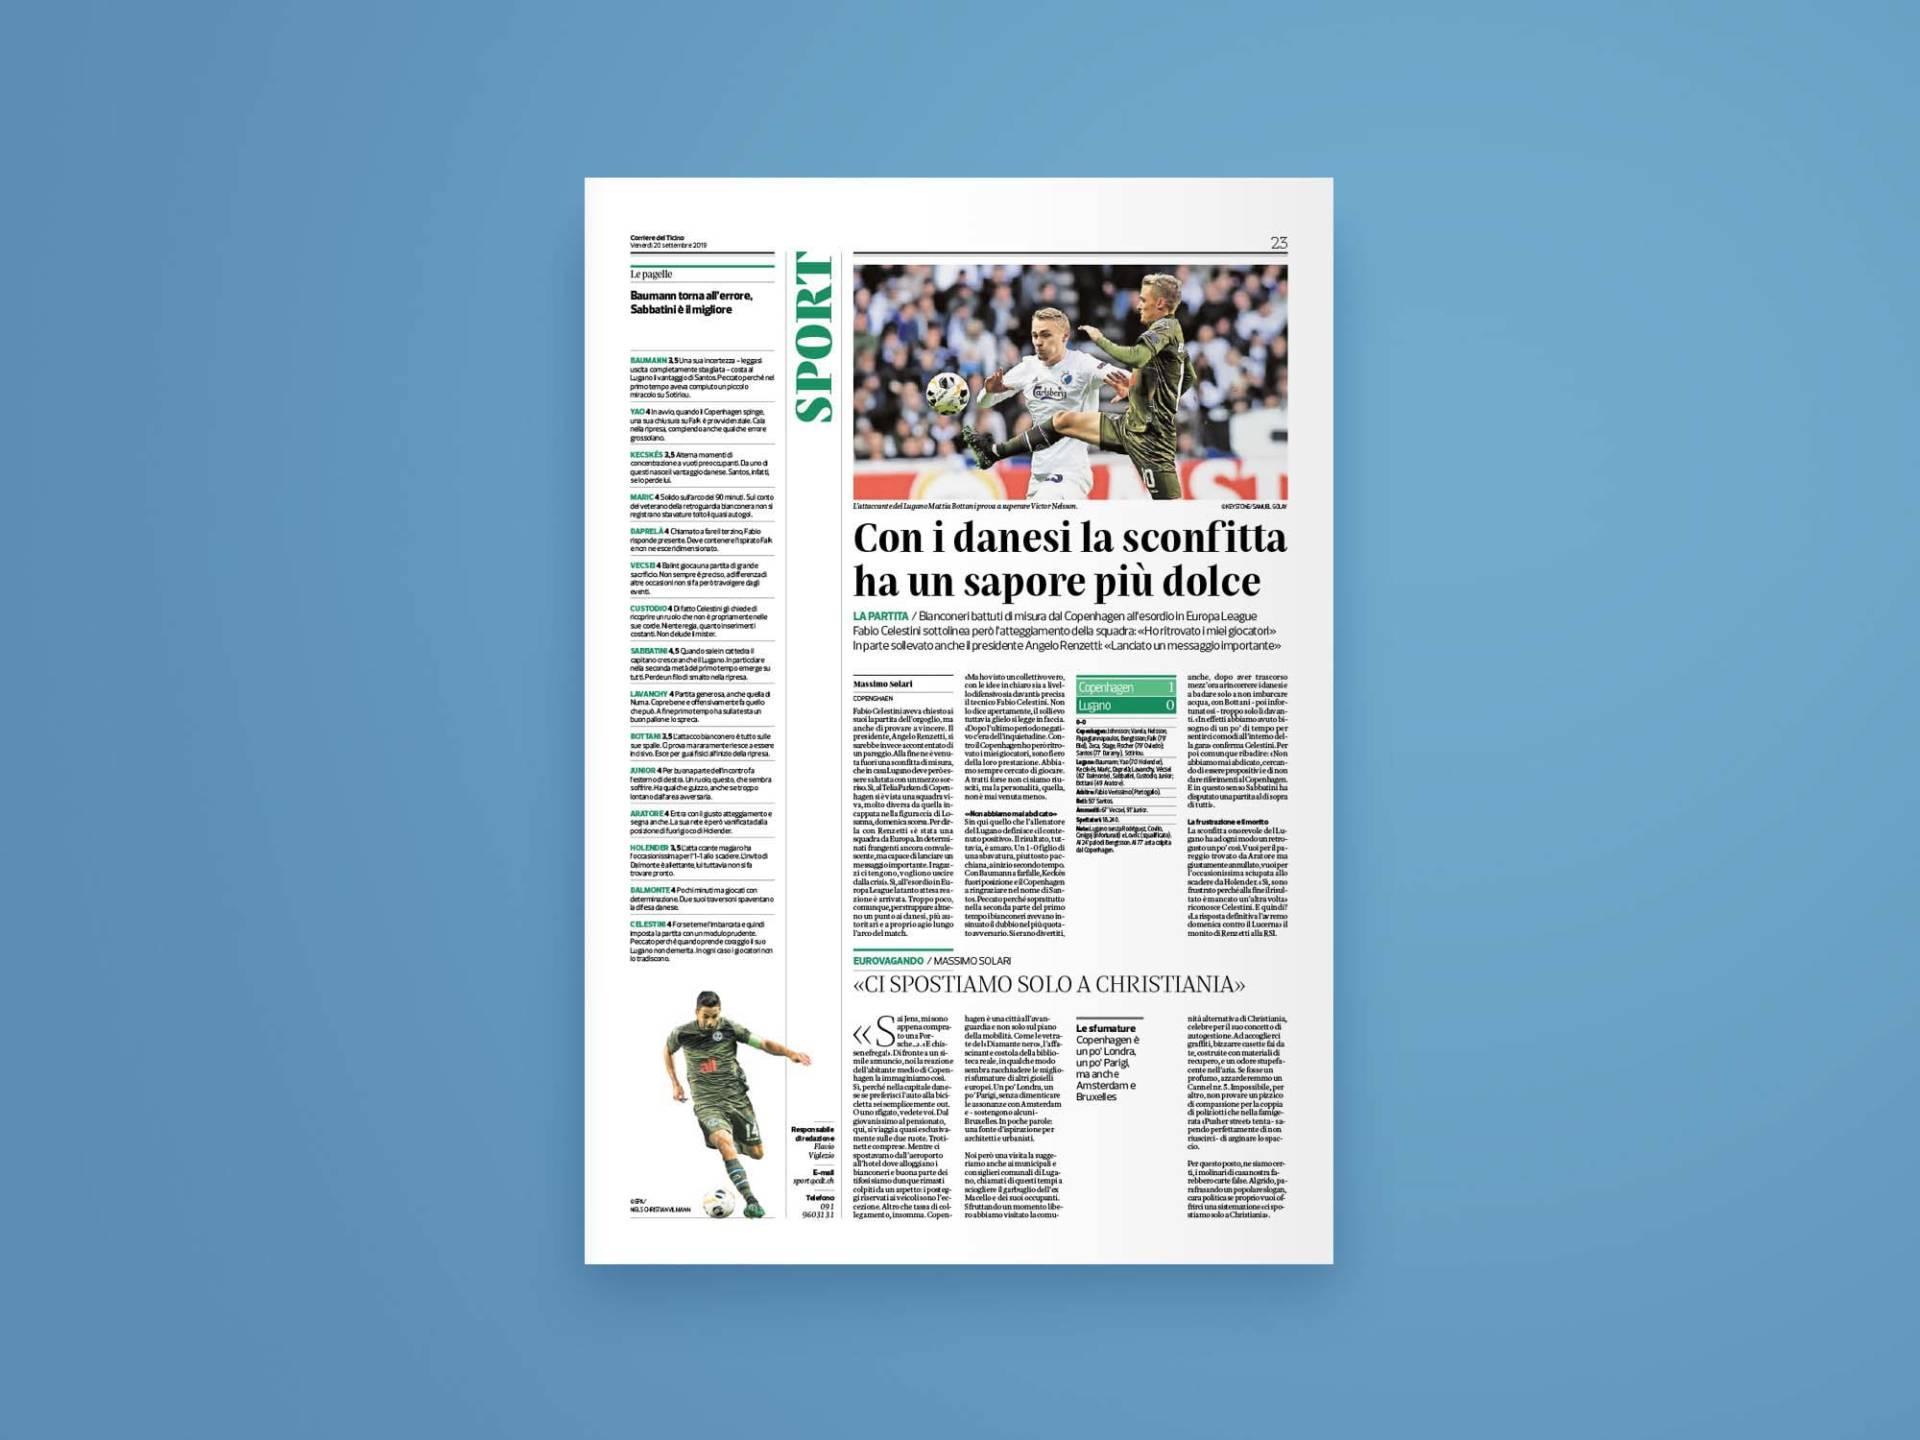 Corriere_Del_Ticino_10_Wenceslau_News_Design